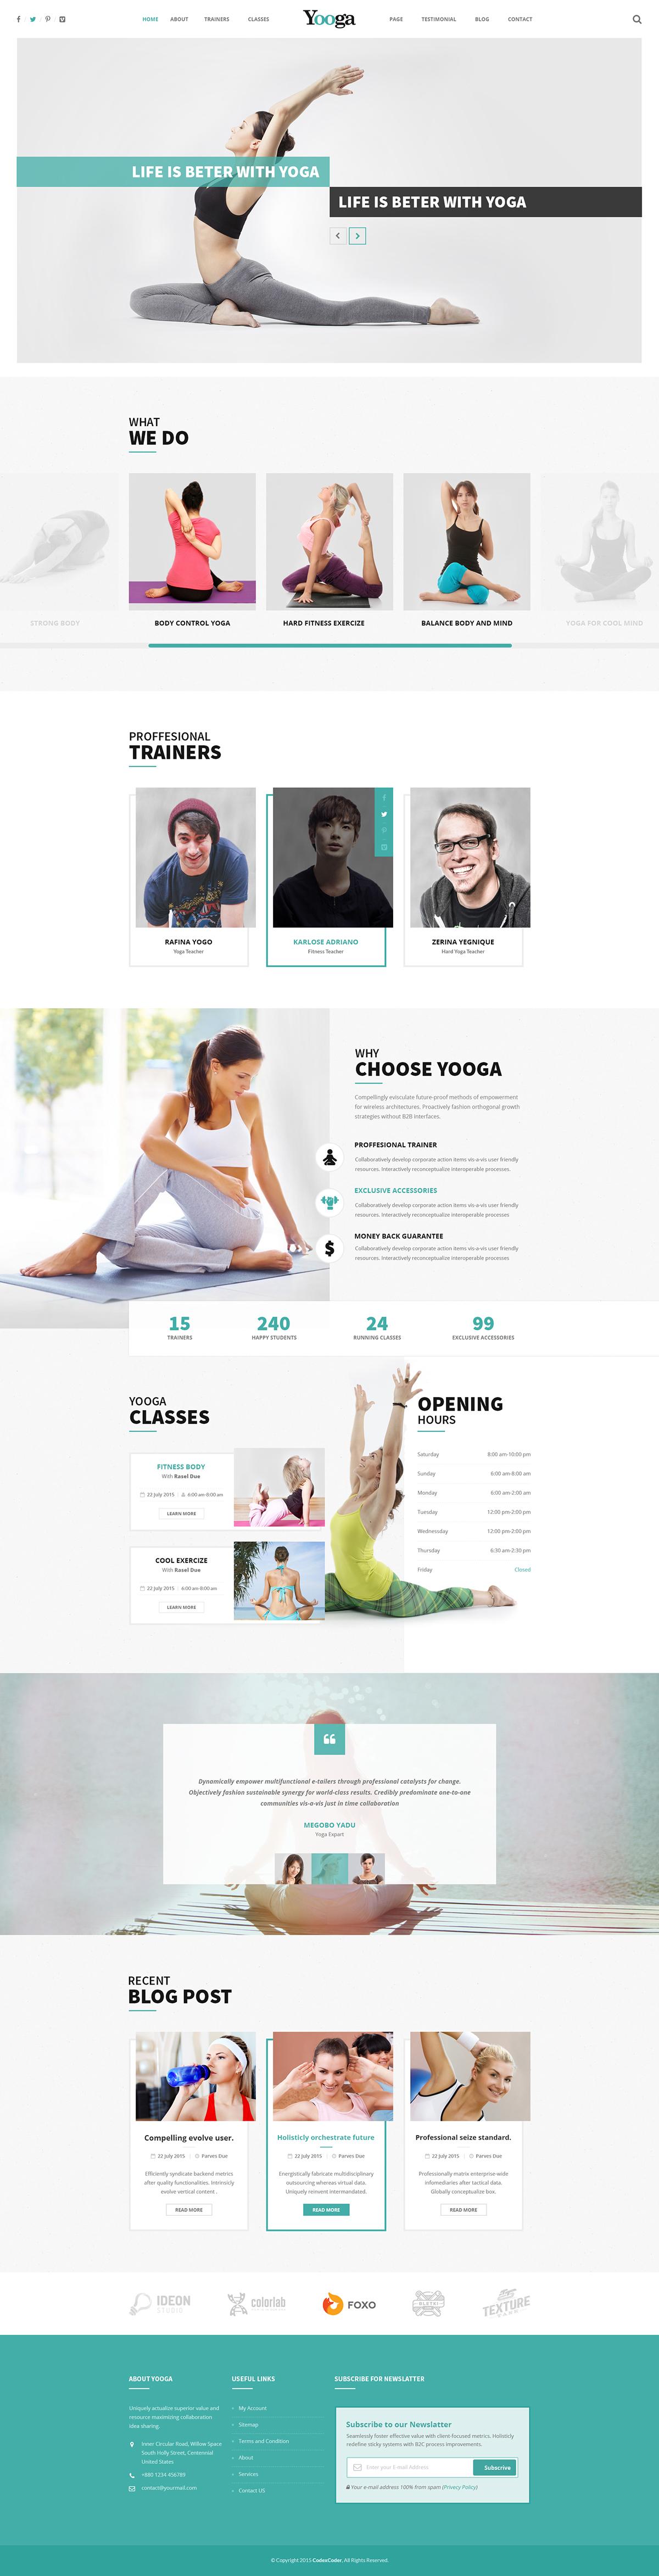 yooga psd template for yoga organizations on behance yoga